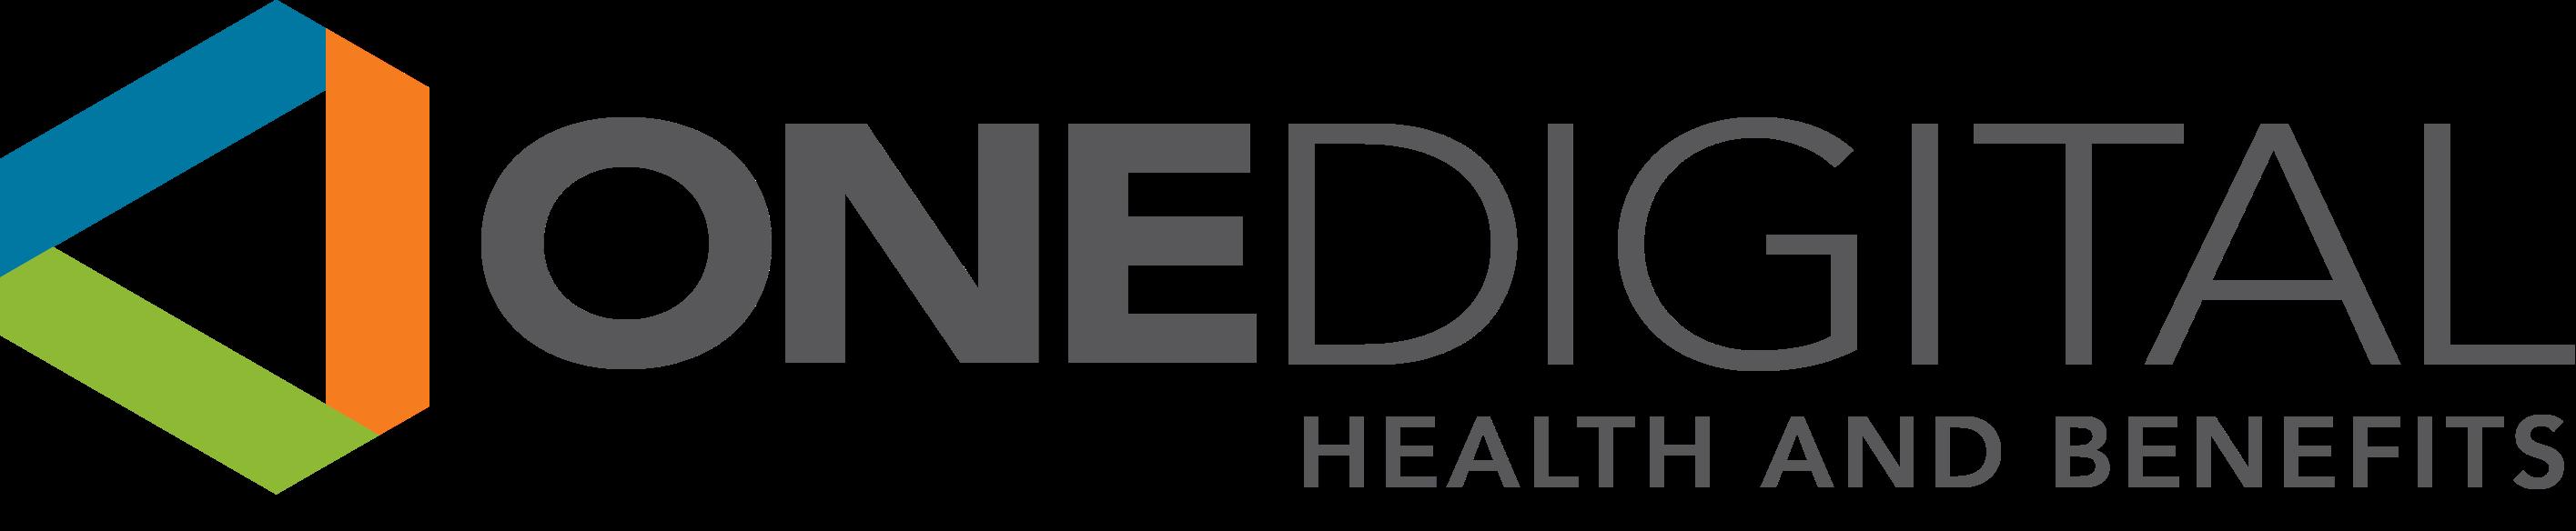 OneDigital Health and Benefits logo